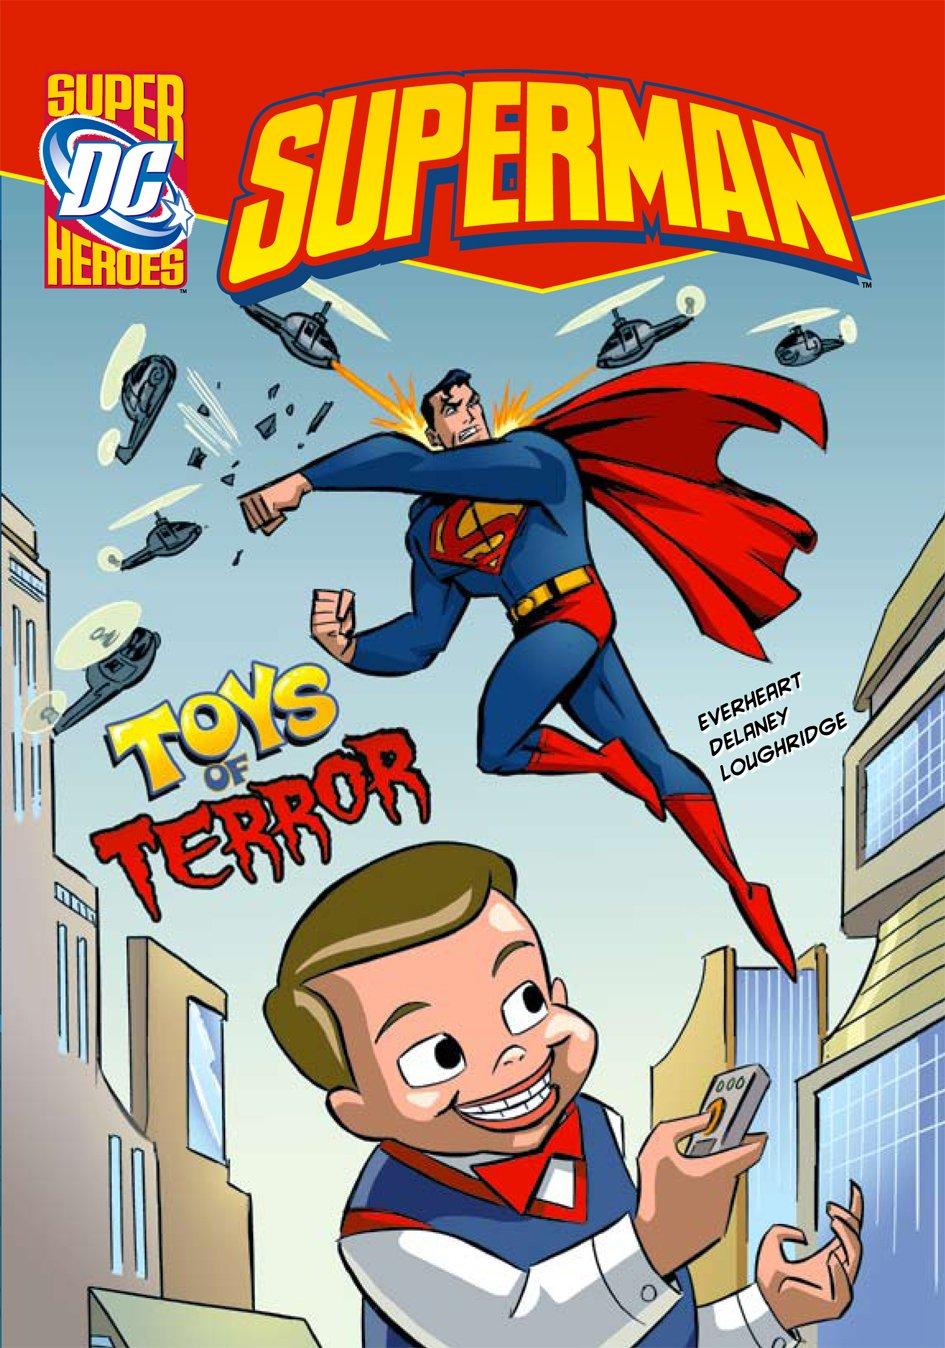 Download Toys of Terror (DC Super Heroes. Superman) ebook